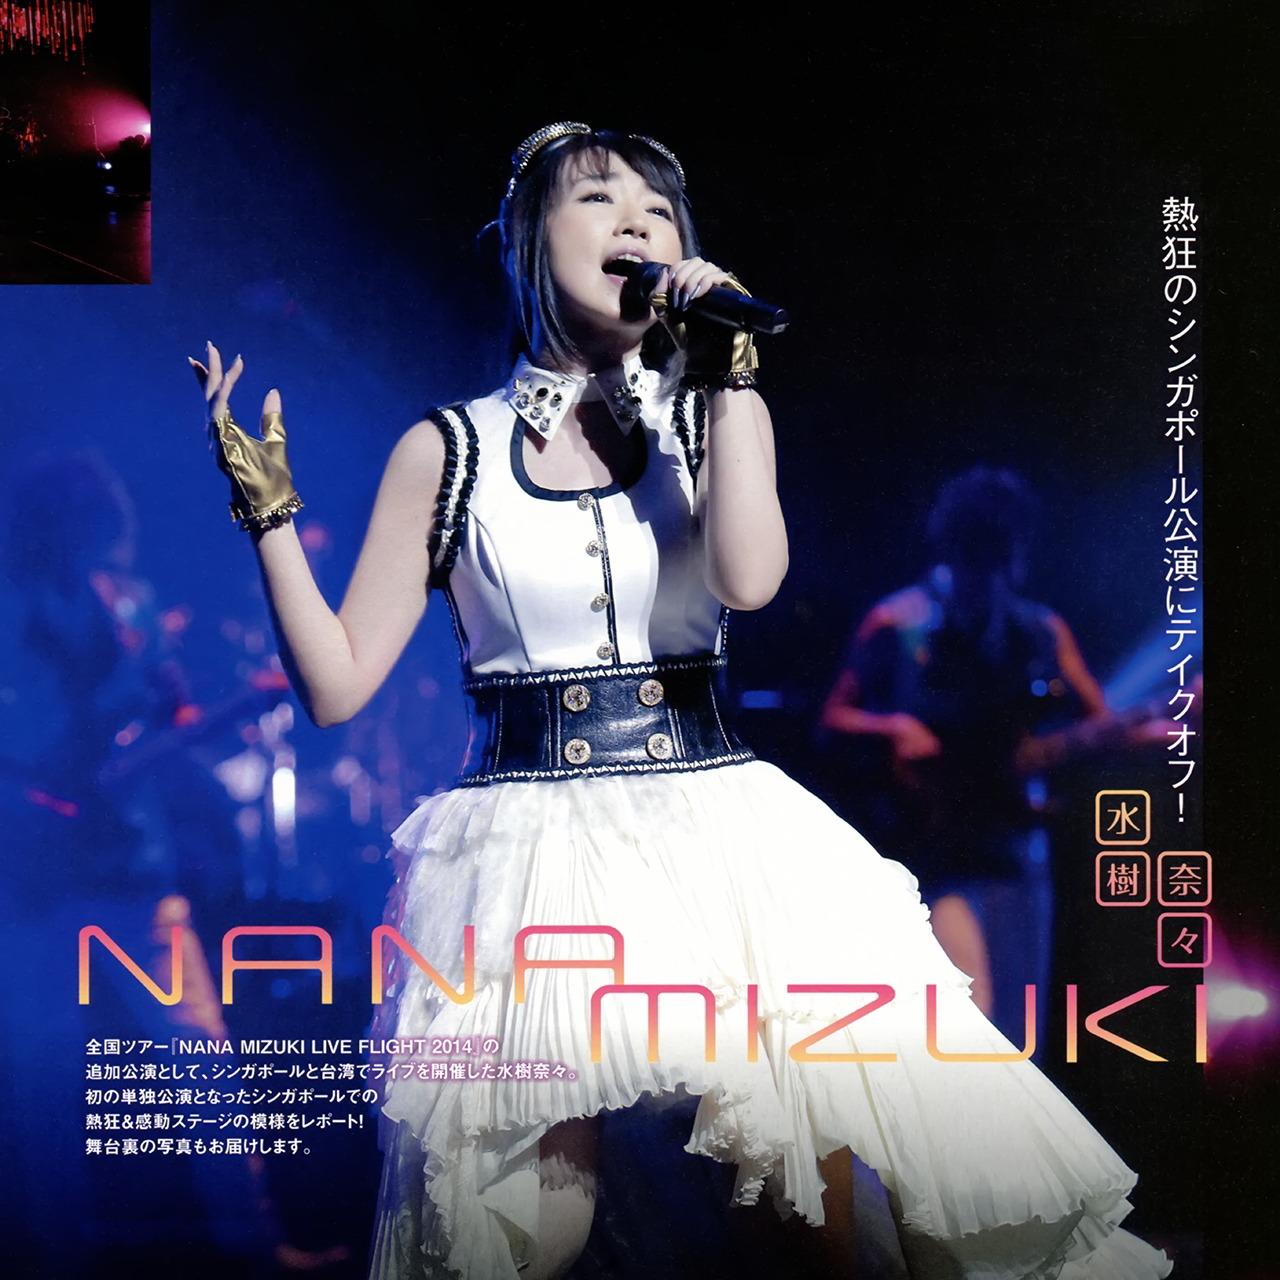 mizuki_nana035.jpg